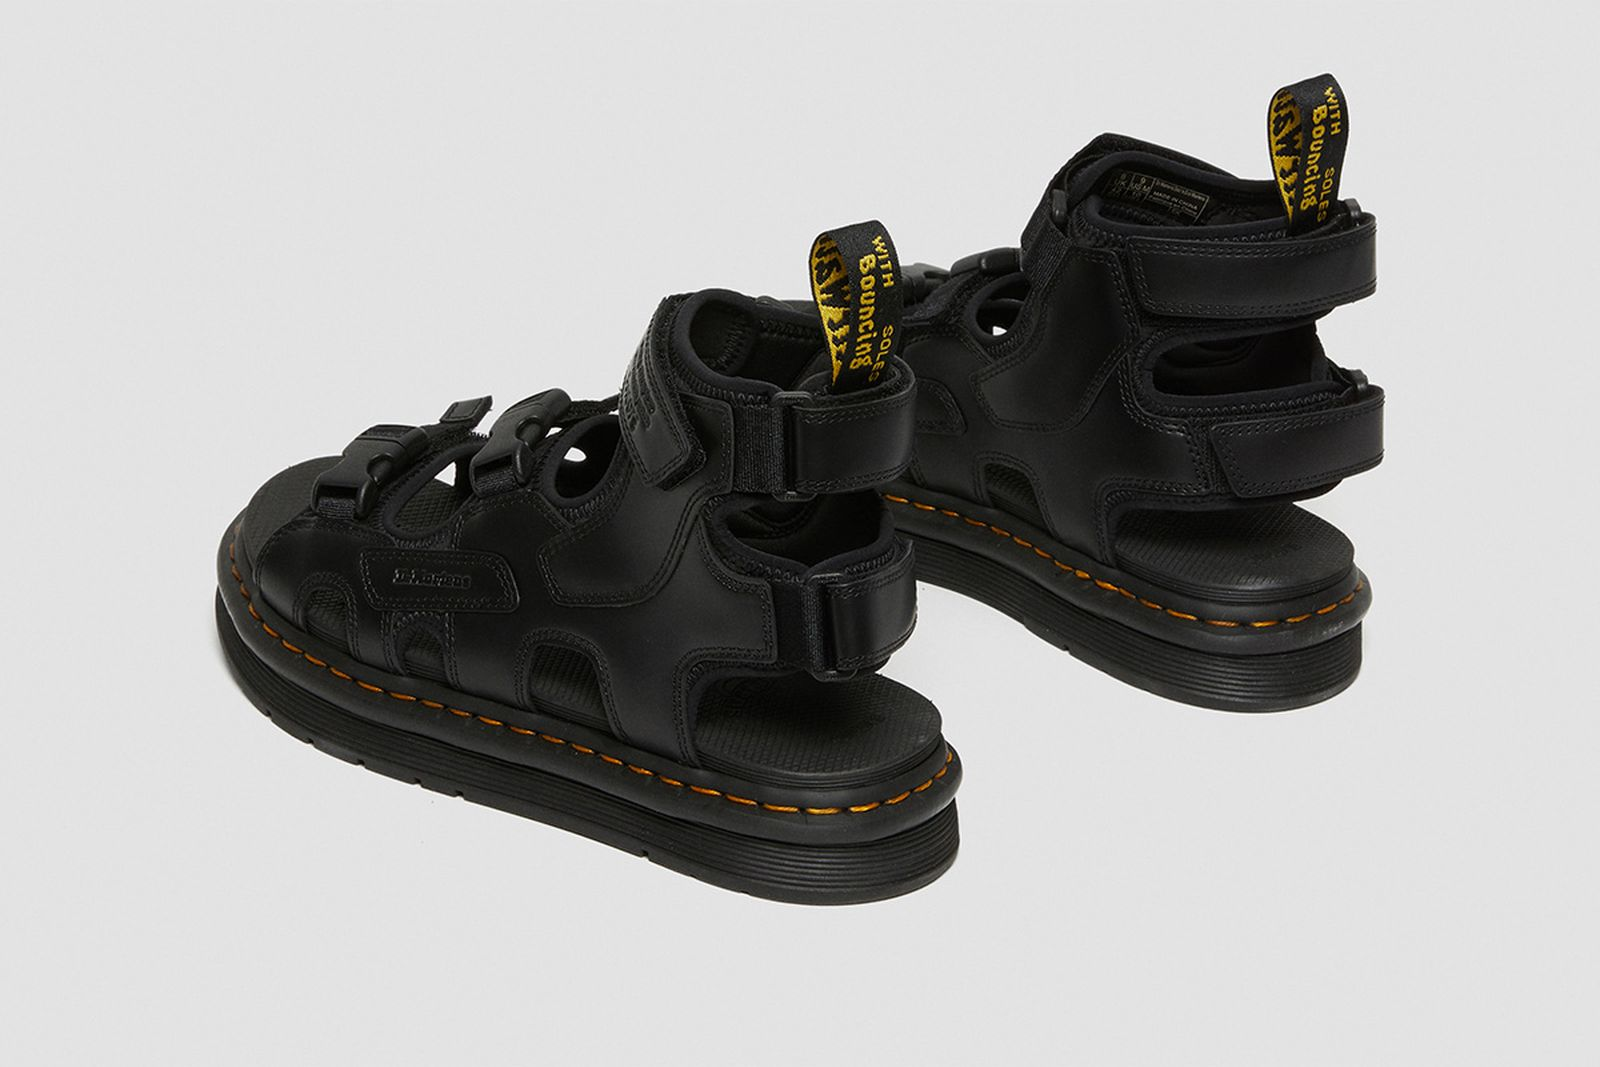 dr-martens-suicoke-sandals-release-date-price-03